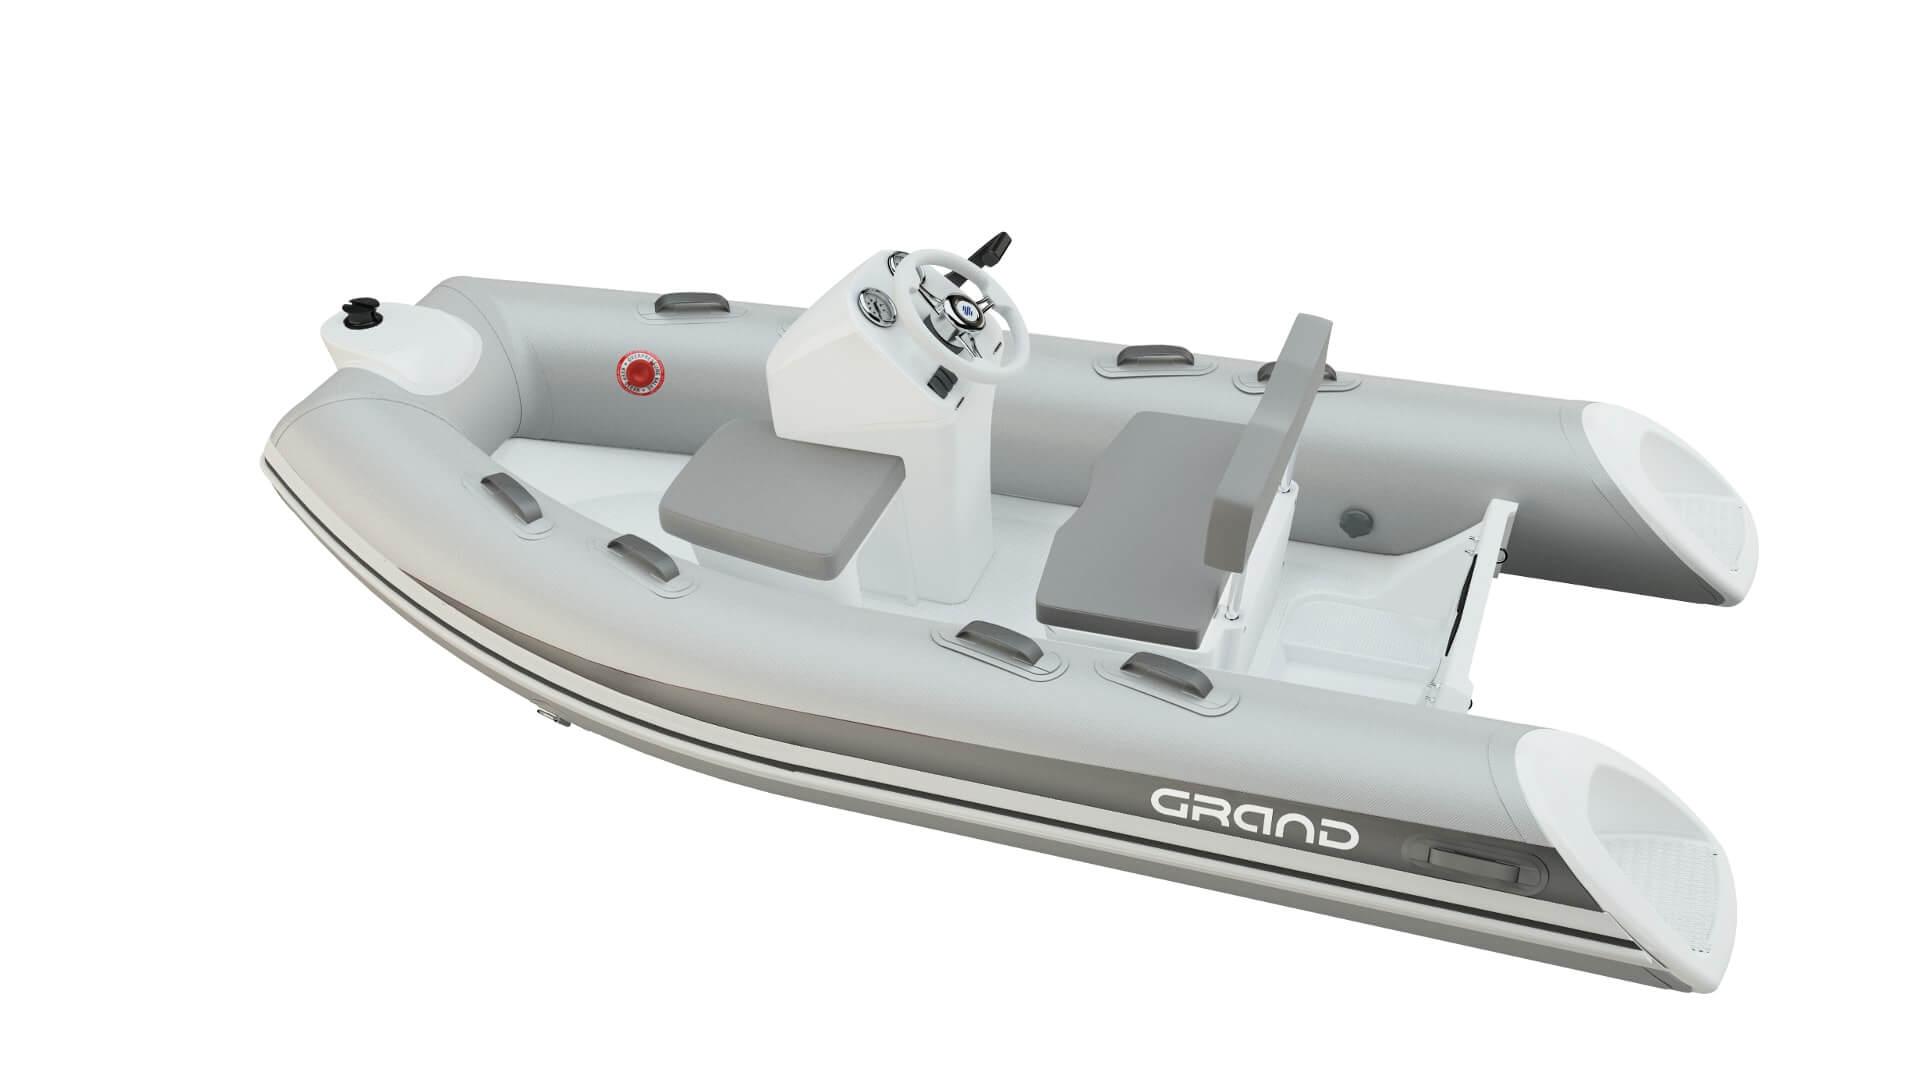 GRAND Silver Line S330L, GRAND S330L, S3330NL, GRAND Silver Line S330L, GRAND Silver Line S330L, GRAND S330L, GRAND S330L, S330L, S330L, Надувная лодка GRAND, Надувная лодка ГРАНД, Надувная лодка с жестким дном, RIB, Rigid Inflatable Boats